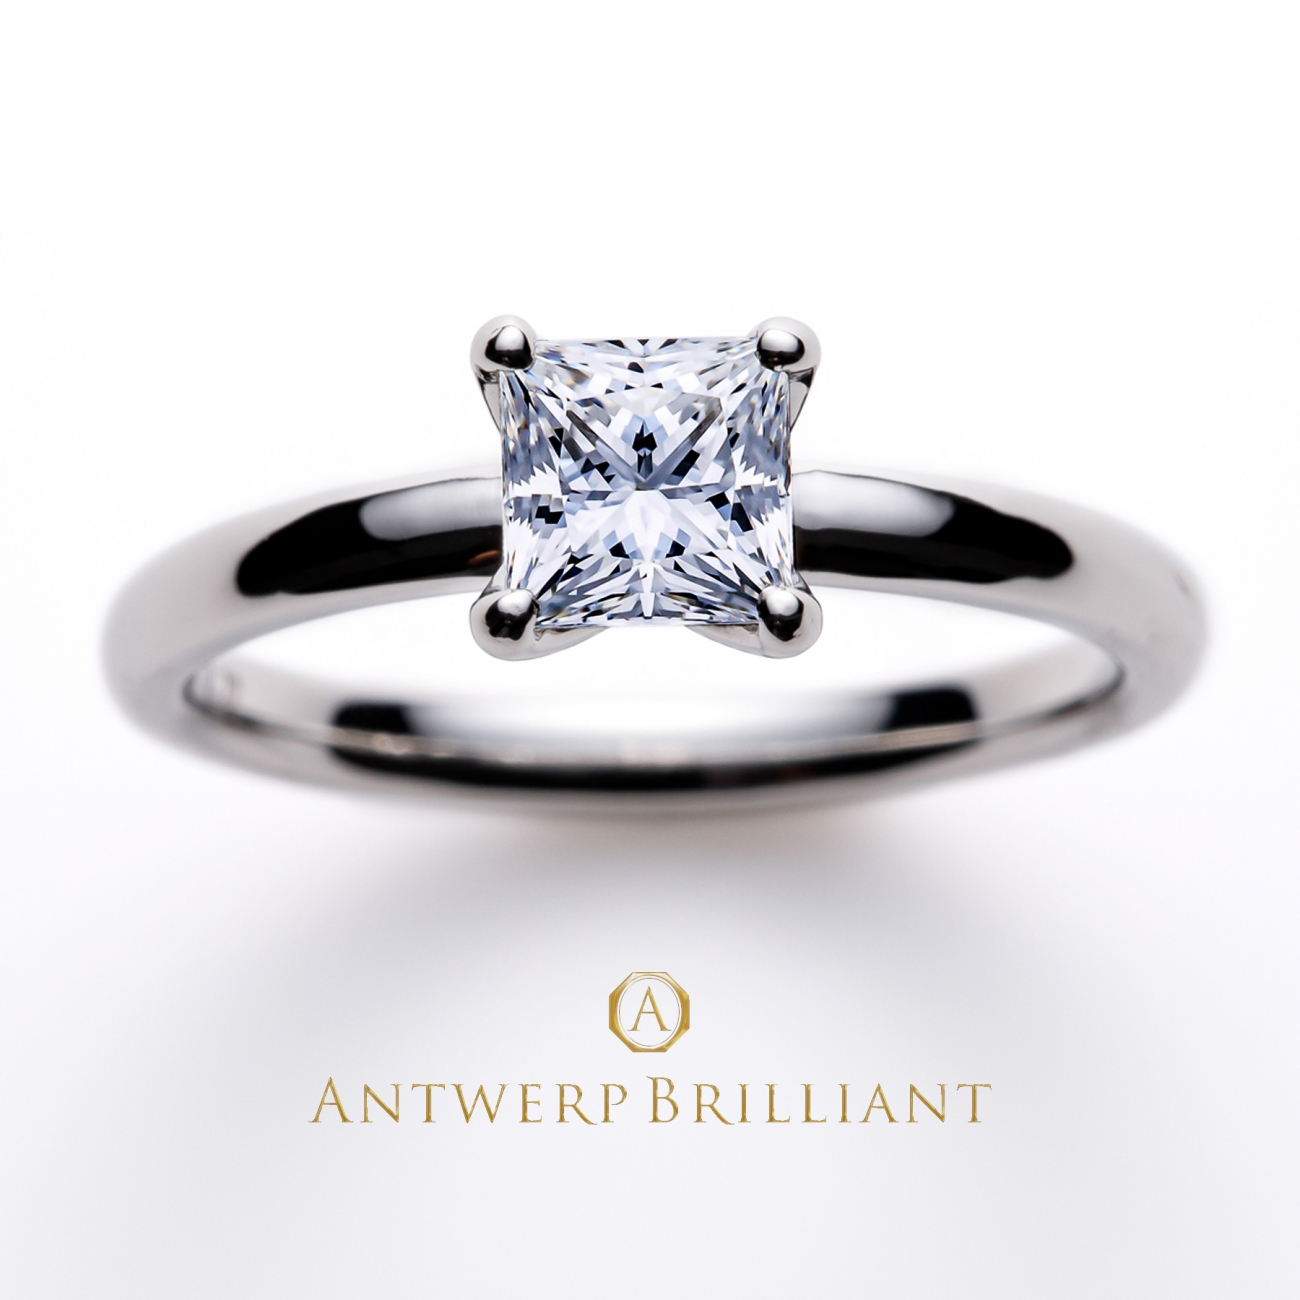 """Asterism""Princess Cut Solitaire Diamond Ring"